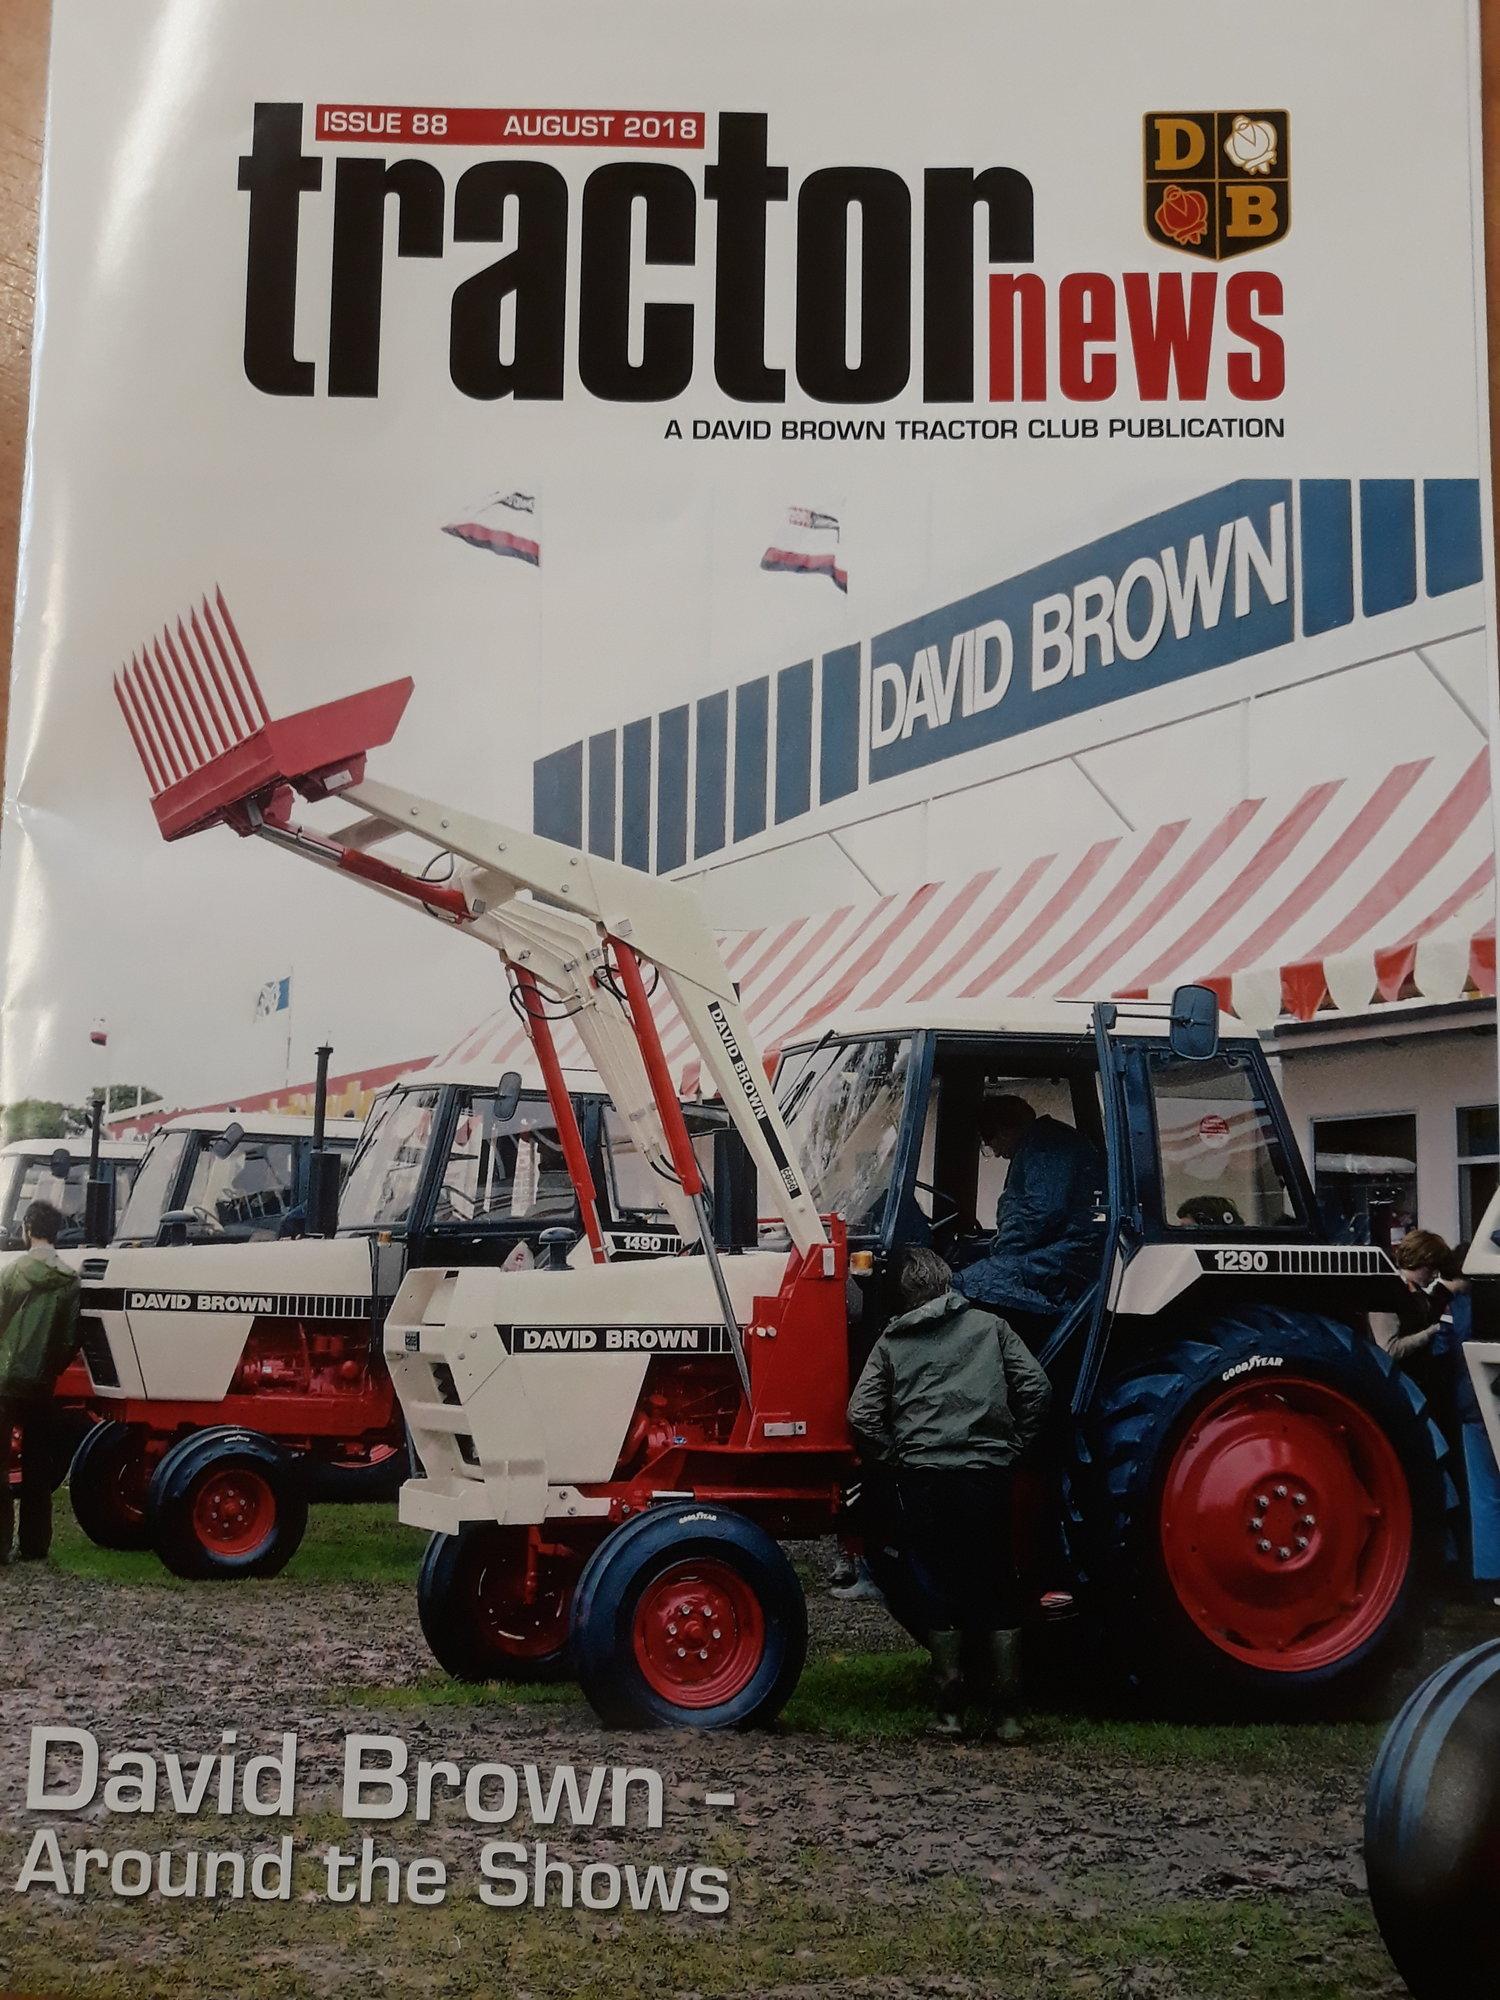 David Brown TRATTORI Portachiavi